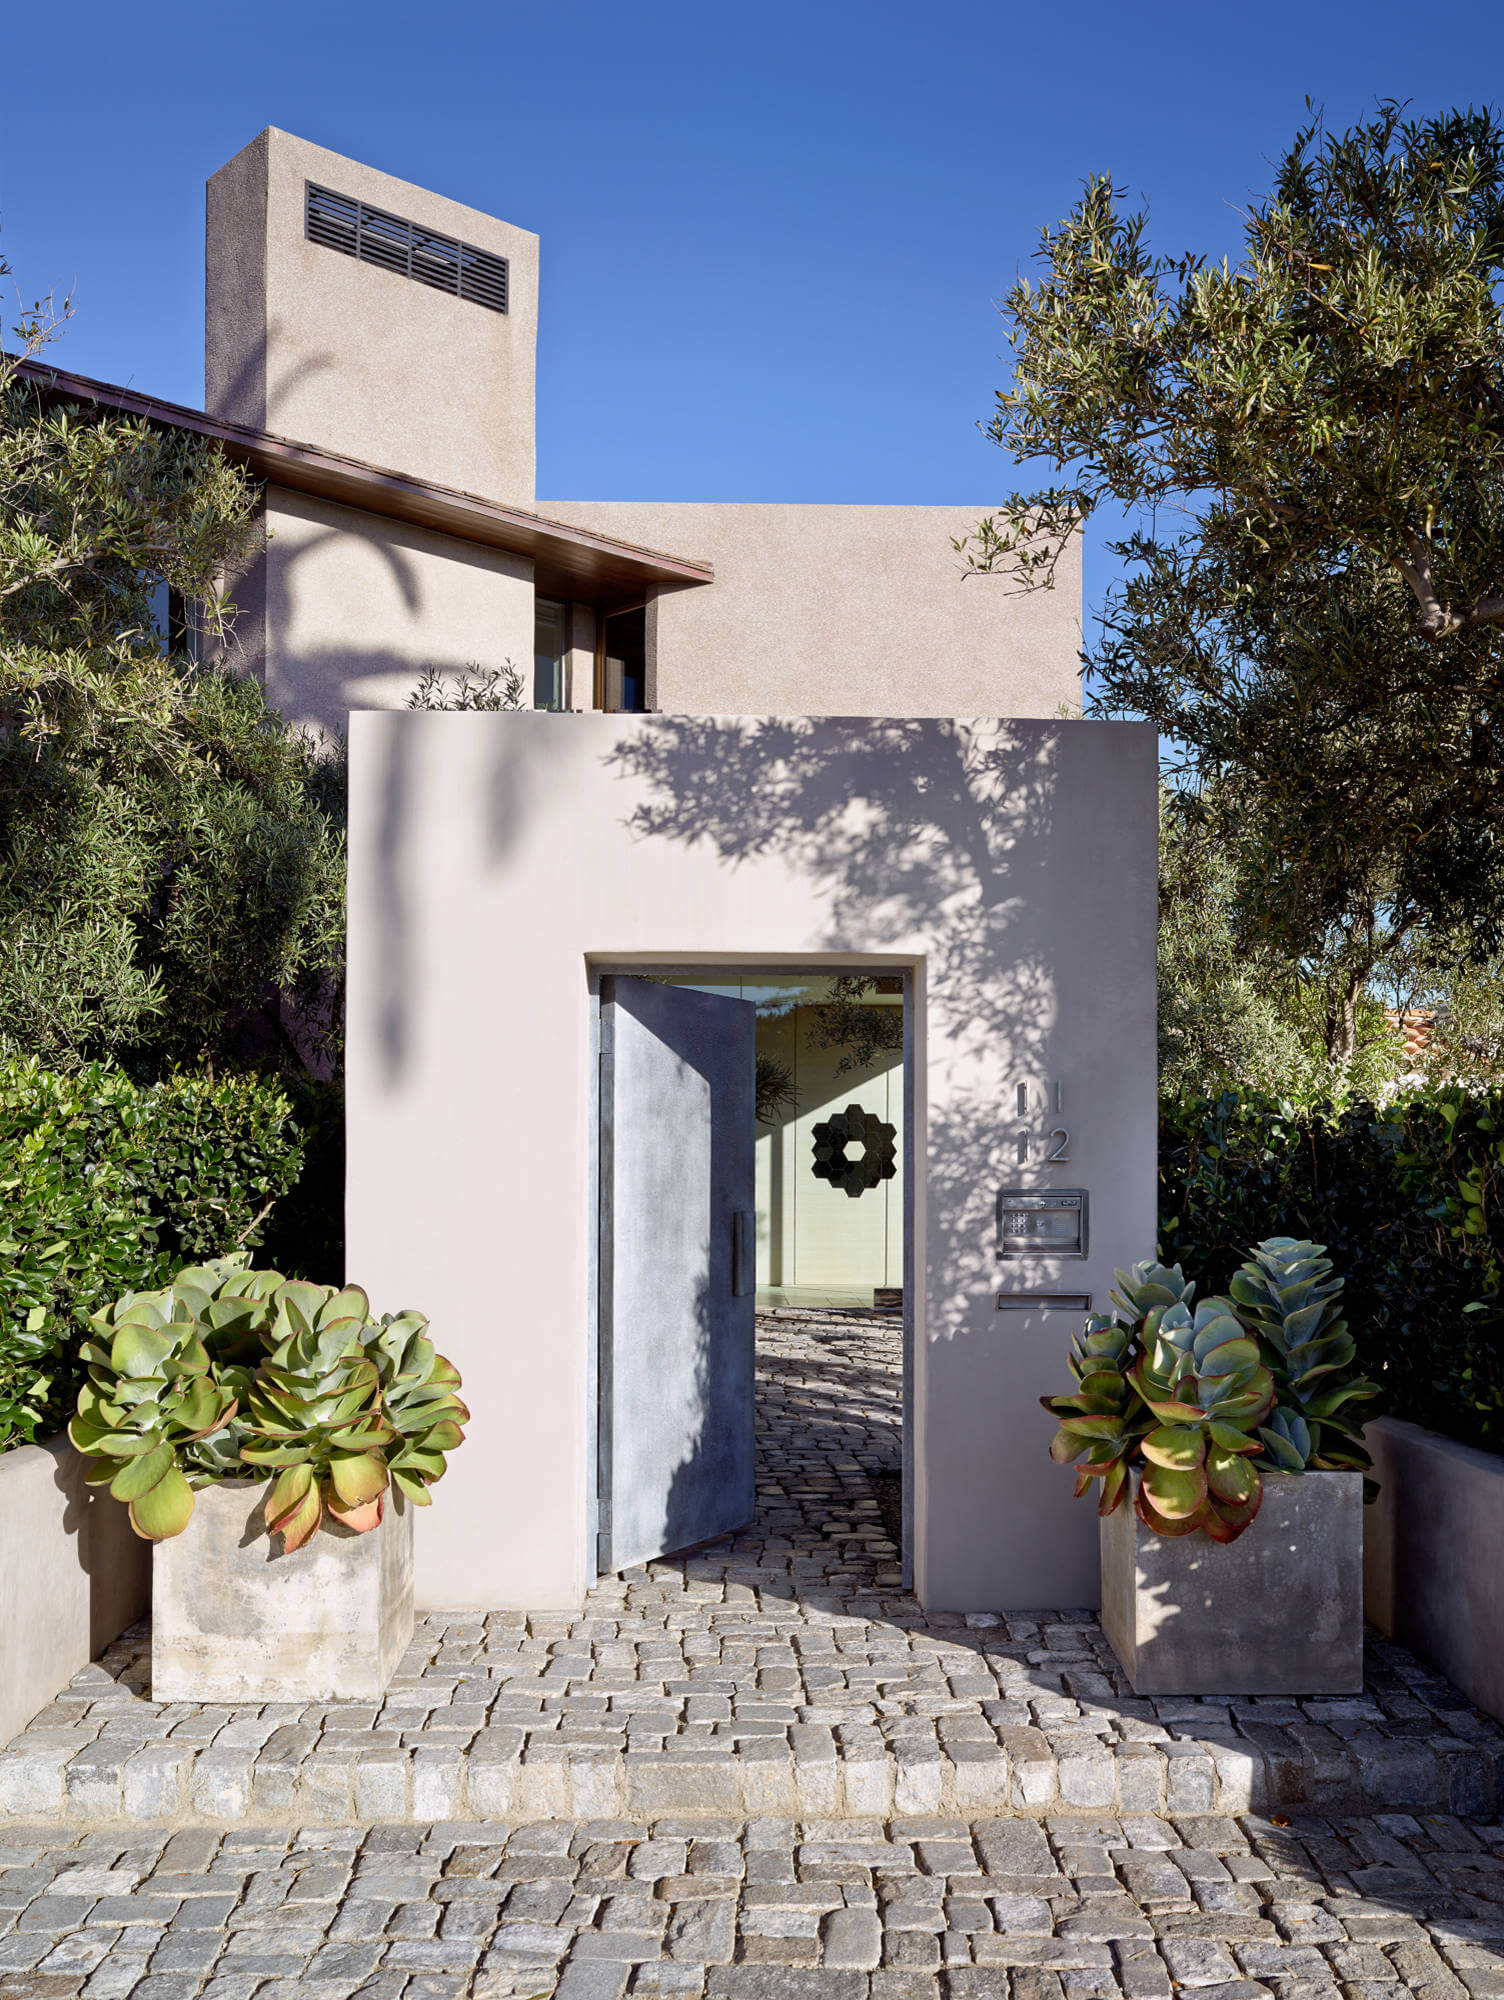 Mediterranean Coronado Residence near San Diego by Island Architects-01